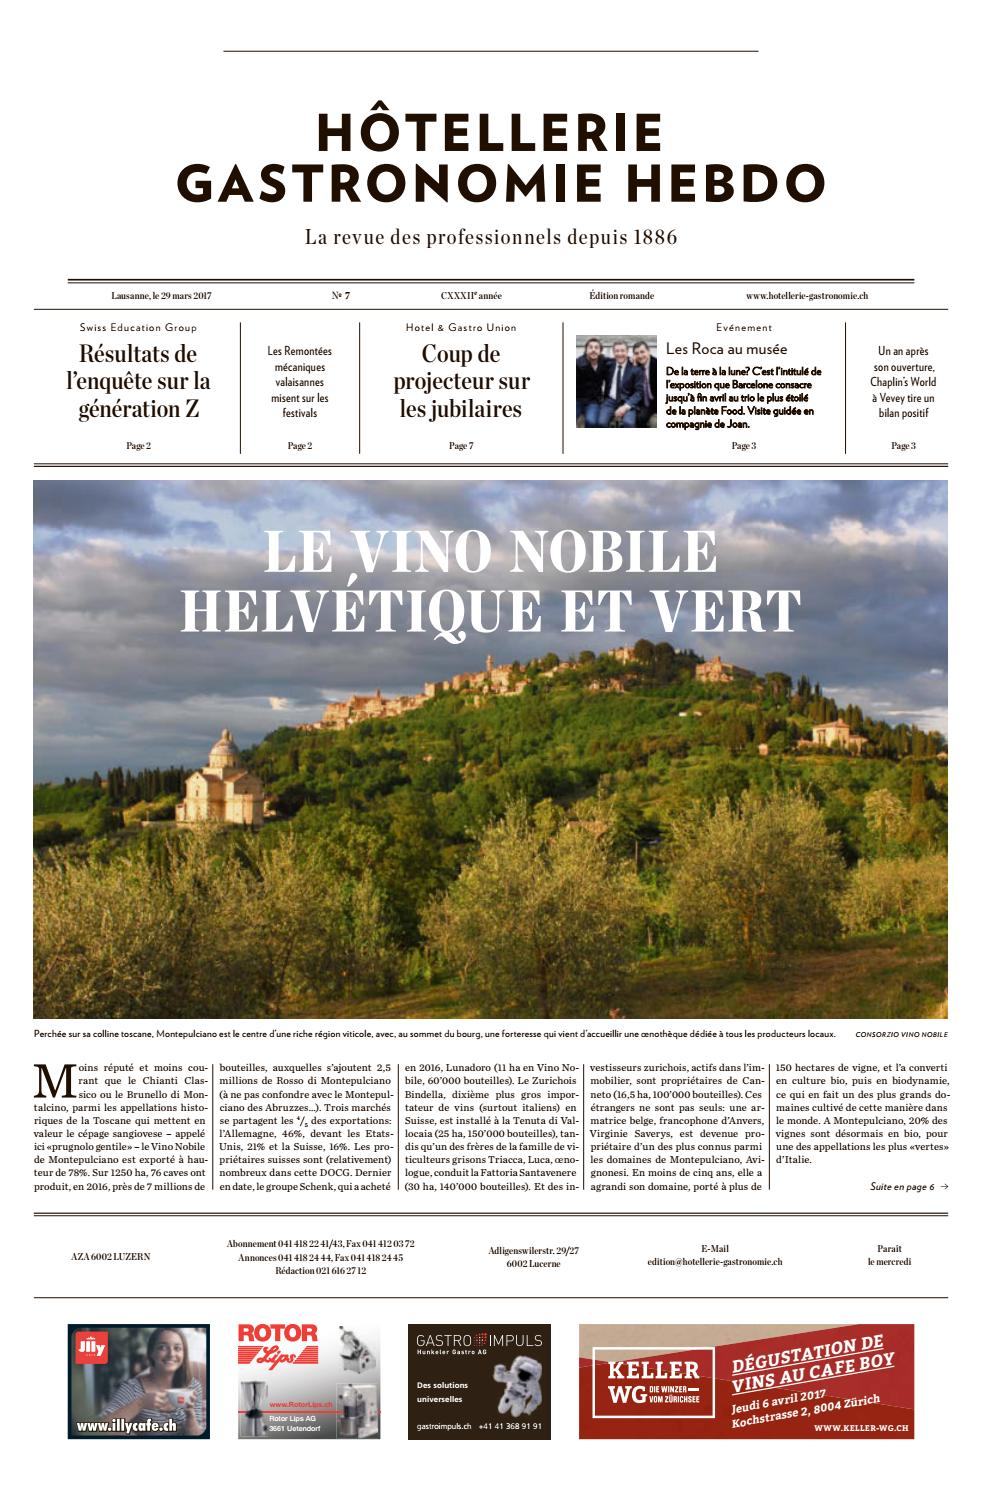 HG Hebdo 7 2017 By Hotellerie Gastronomie Verlag